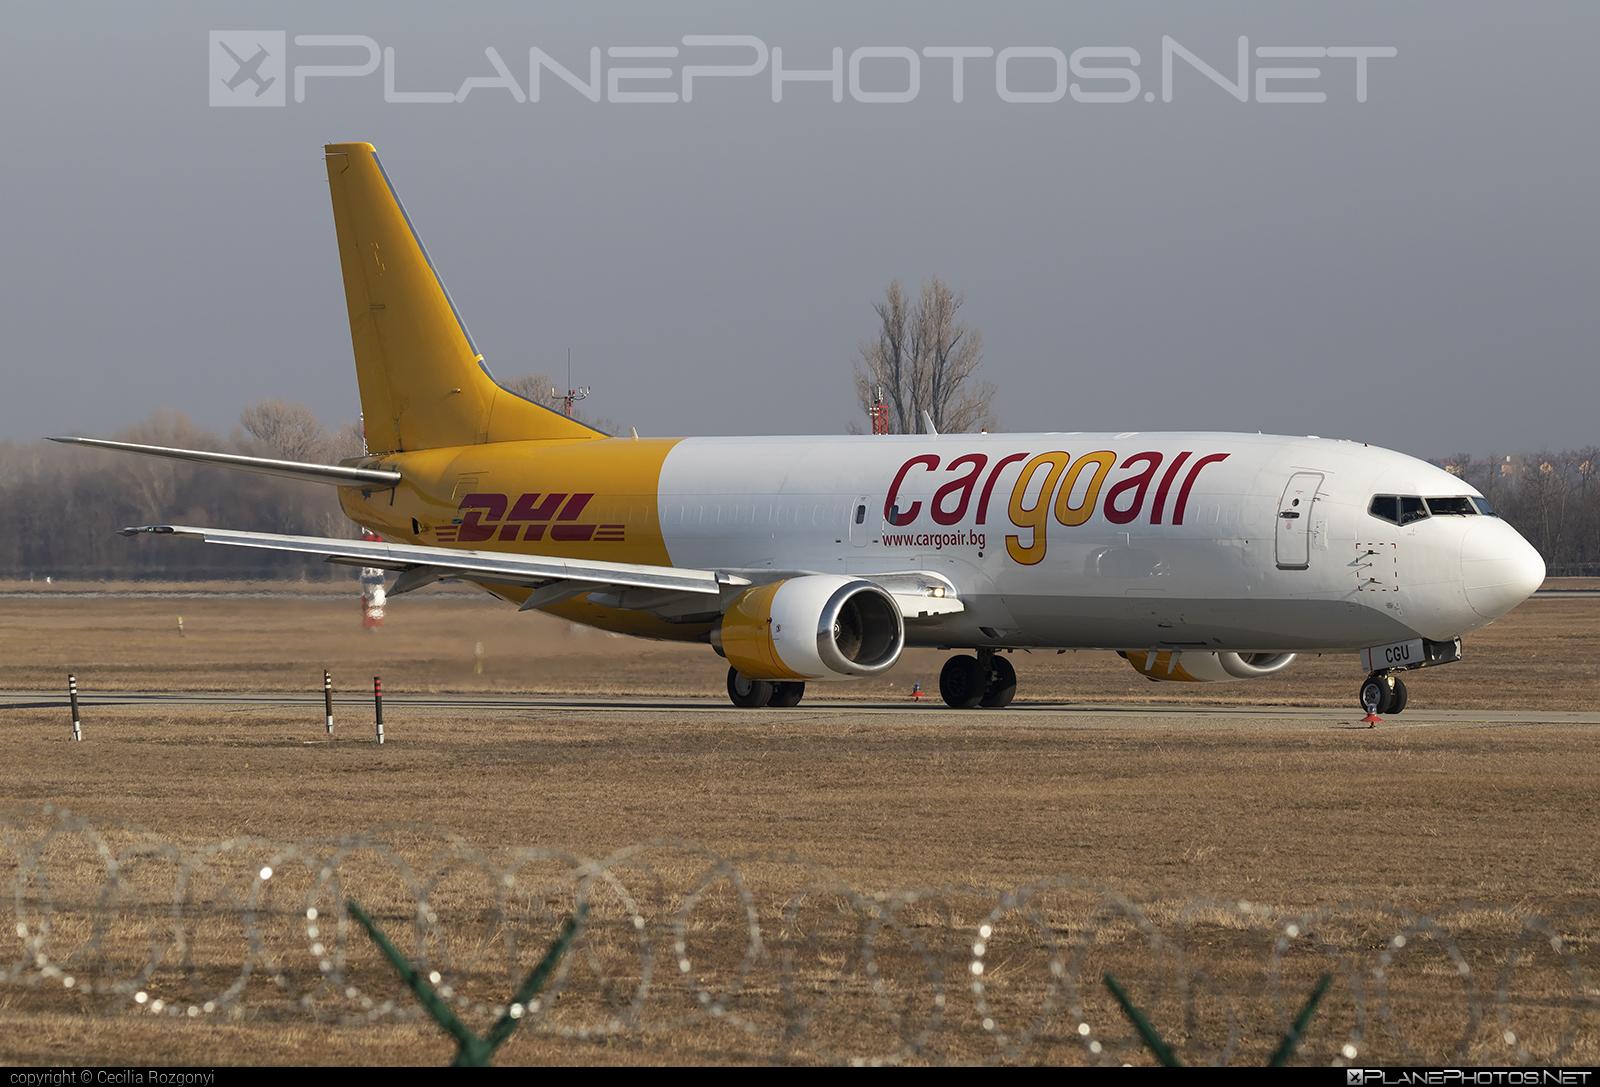 Boeing 737-400SF - LZ-CGU operated by Cargo Air #b737 #b737freighter #b737sf #boeing #boeing737